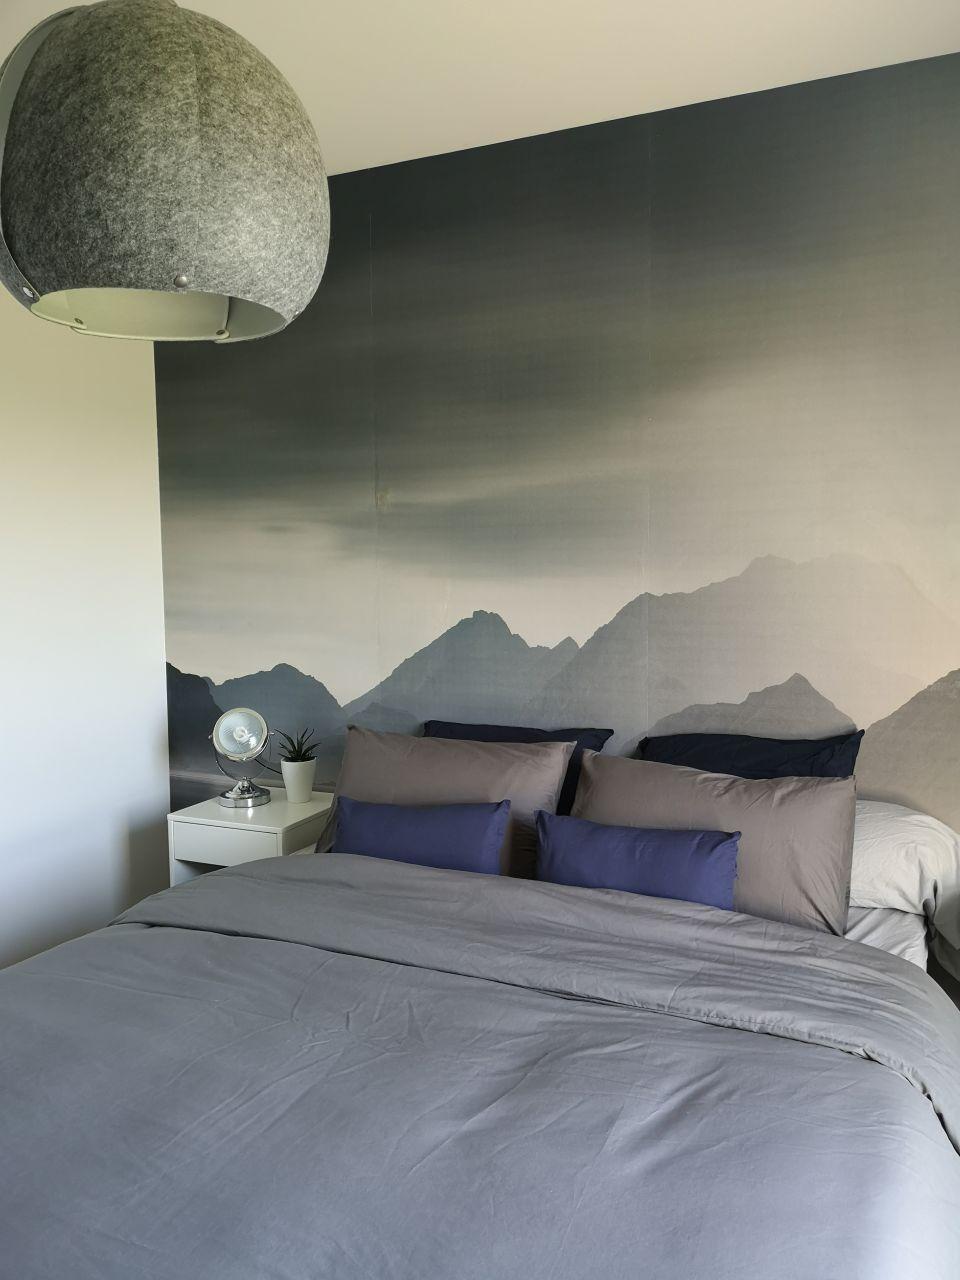 Panorama tête de lit